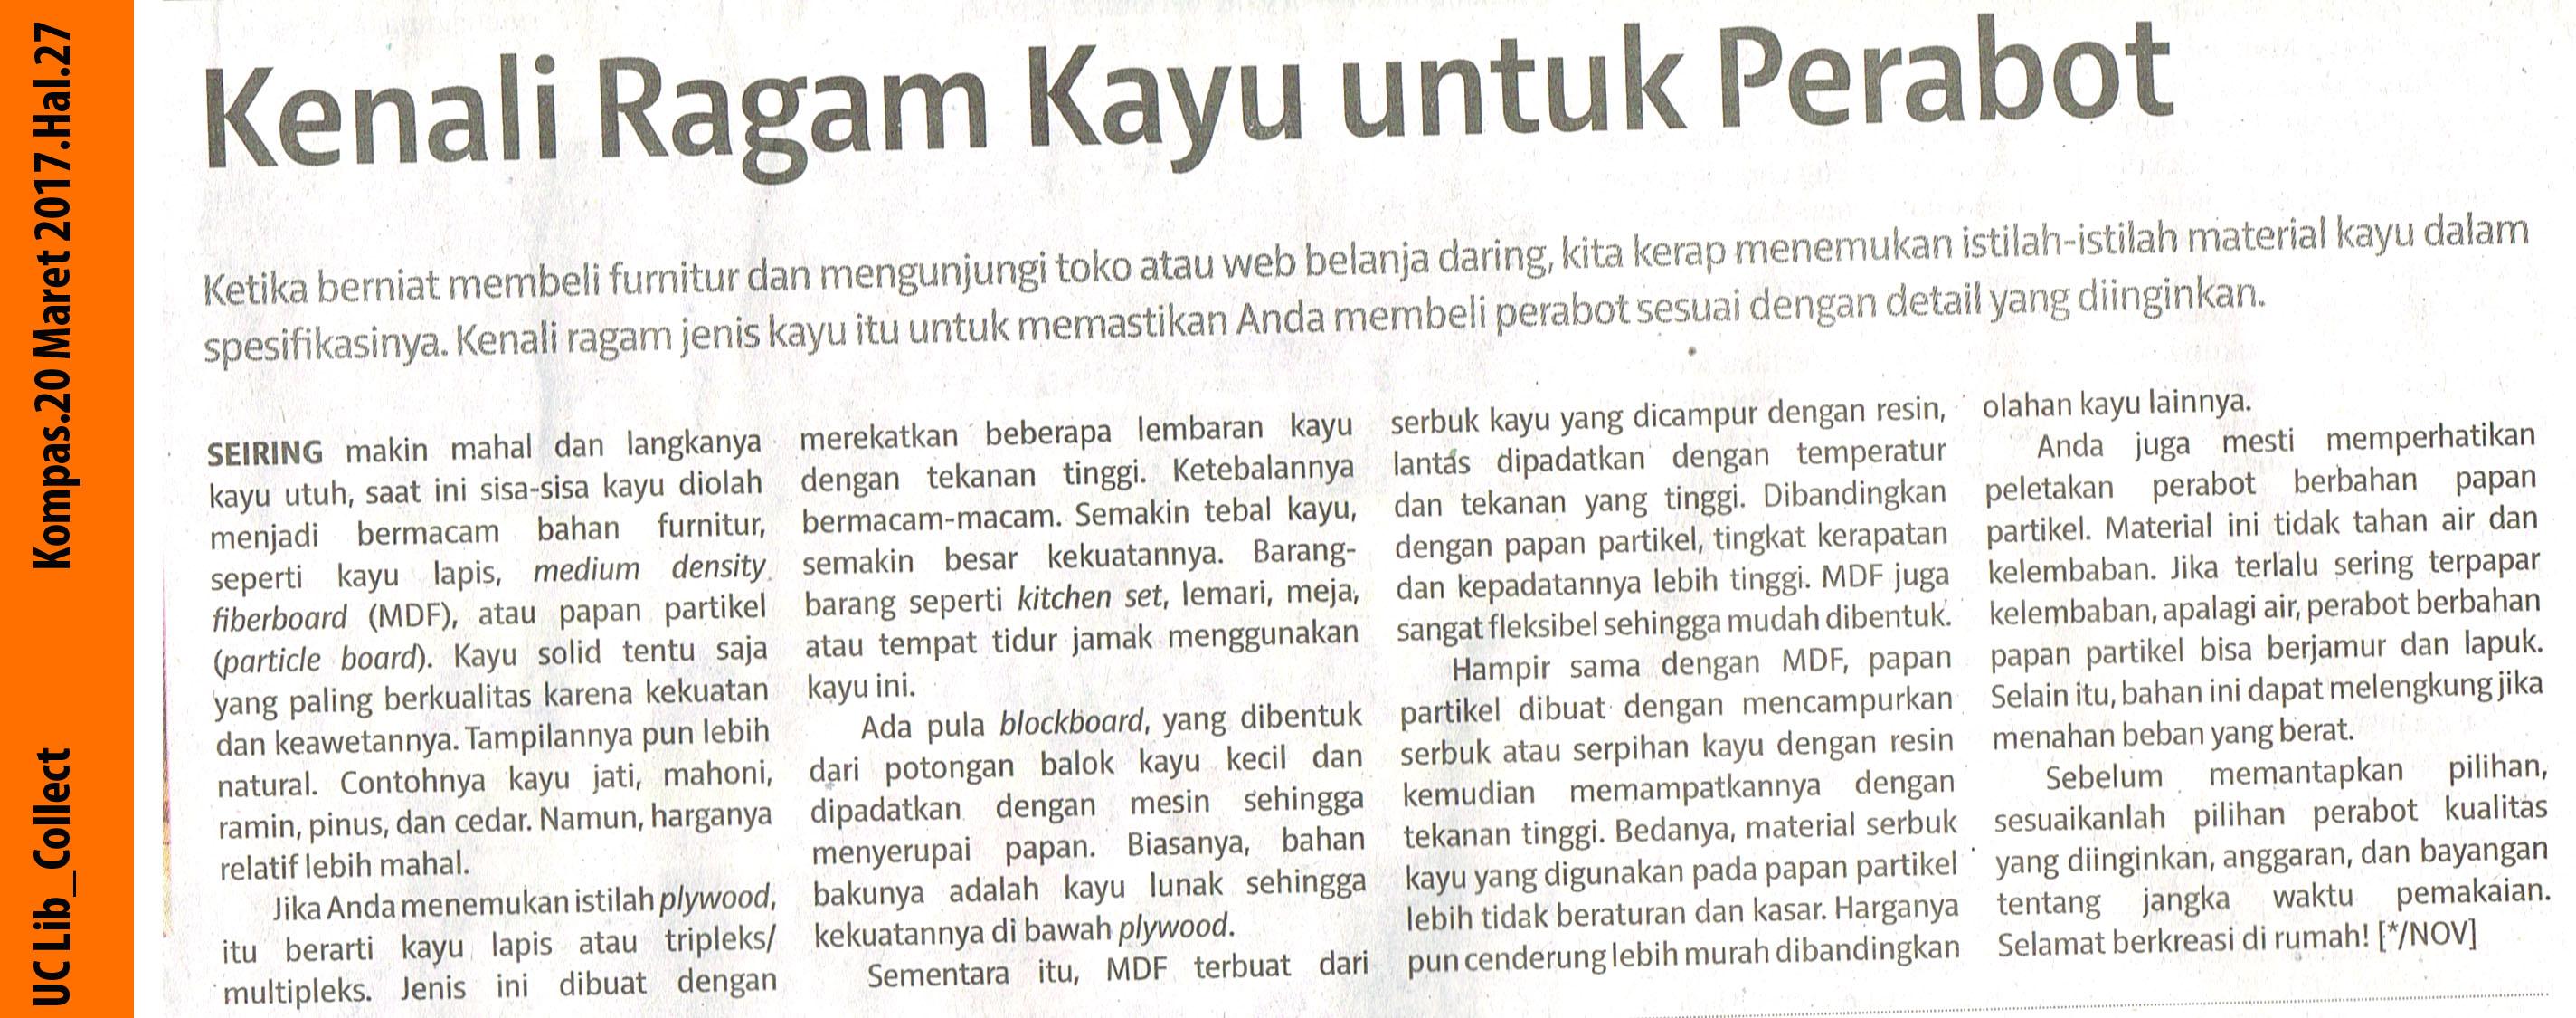 Kanali Ragam Kayu Untuk Perabotan.Kompas.20 Maret 2017.Hal.27